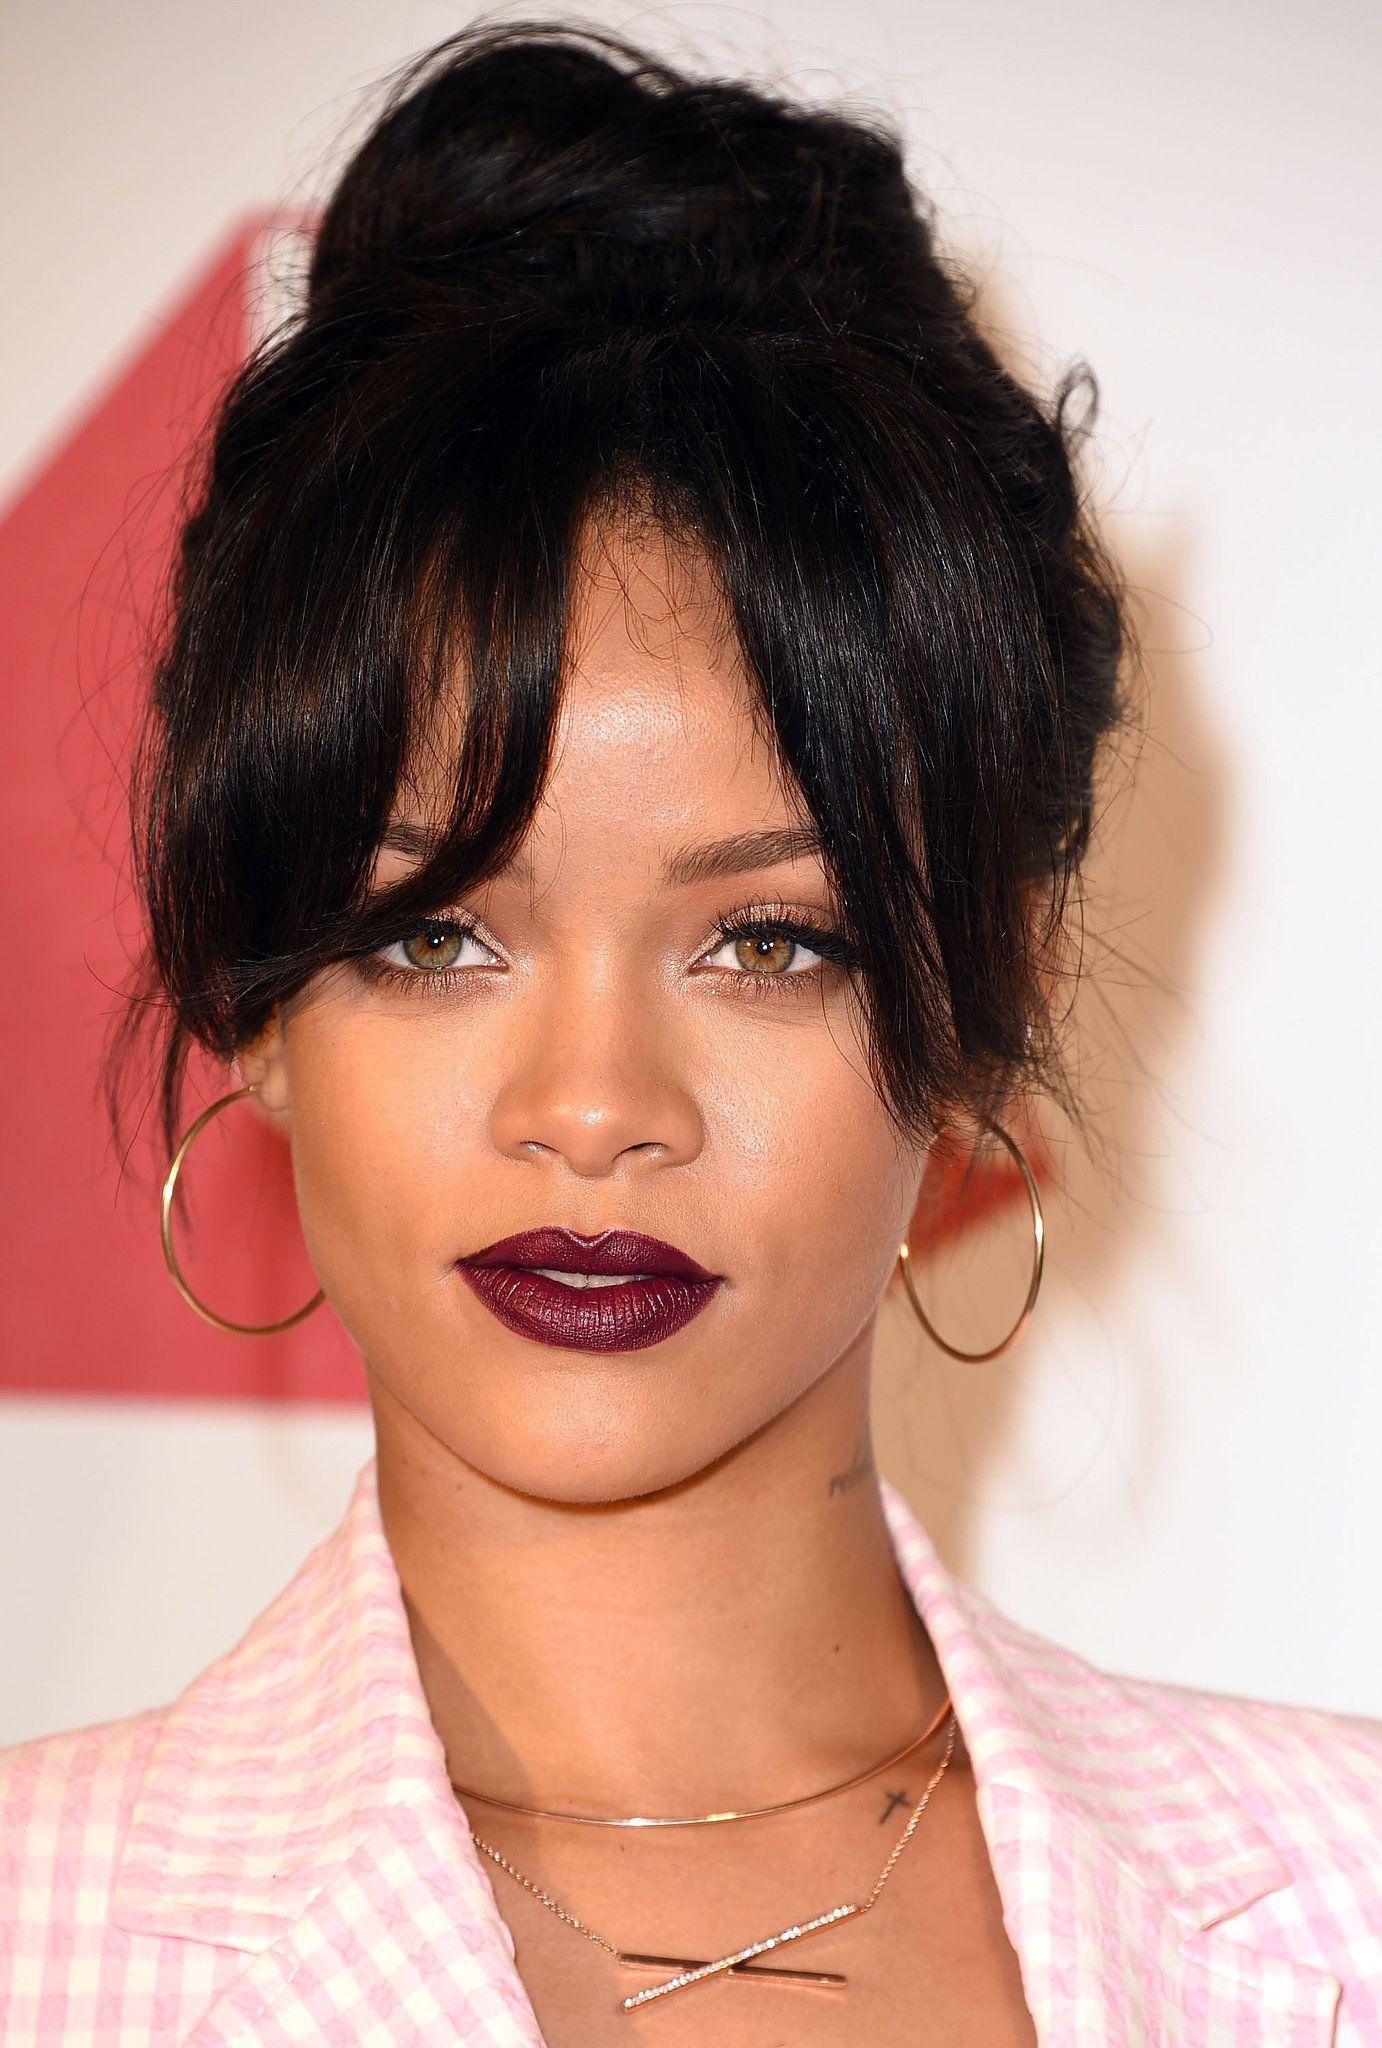 Rihanna Rihanna makeup, Hair beauty__cat__, Rihanna